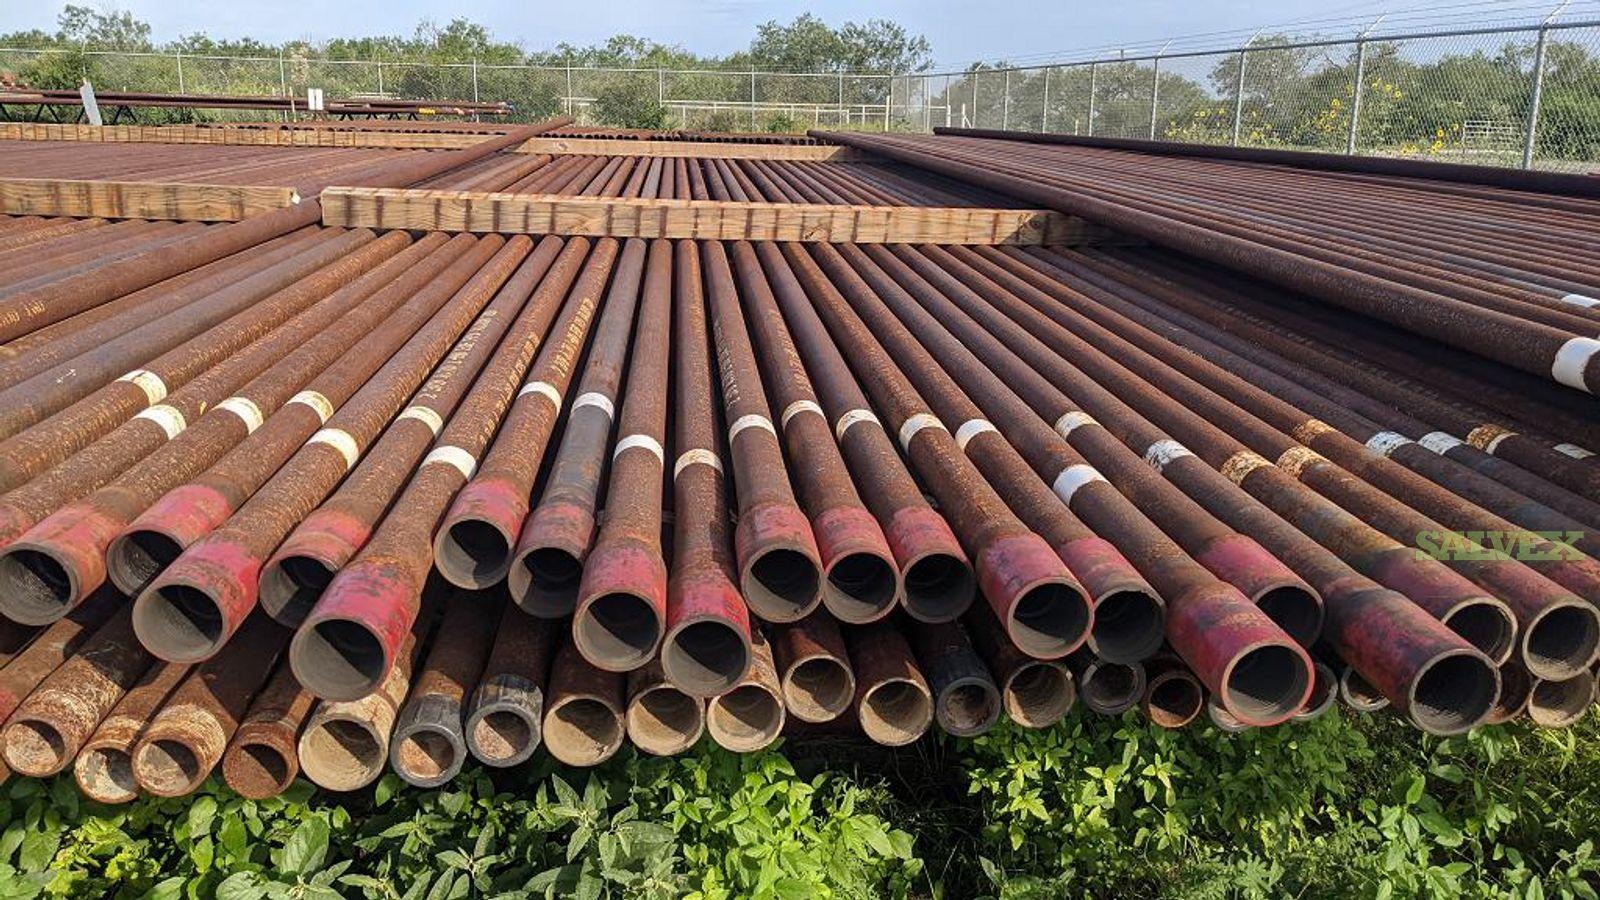 1 1/2 - 4 L80 EUE R2 Used Tubing (49,410 Feet / 153 Metric Tons)